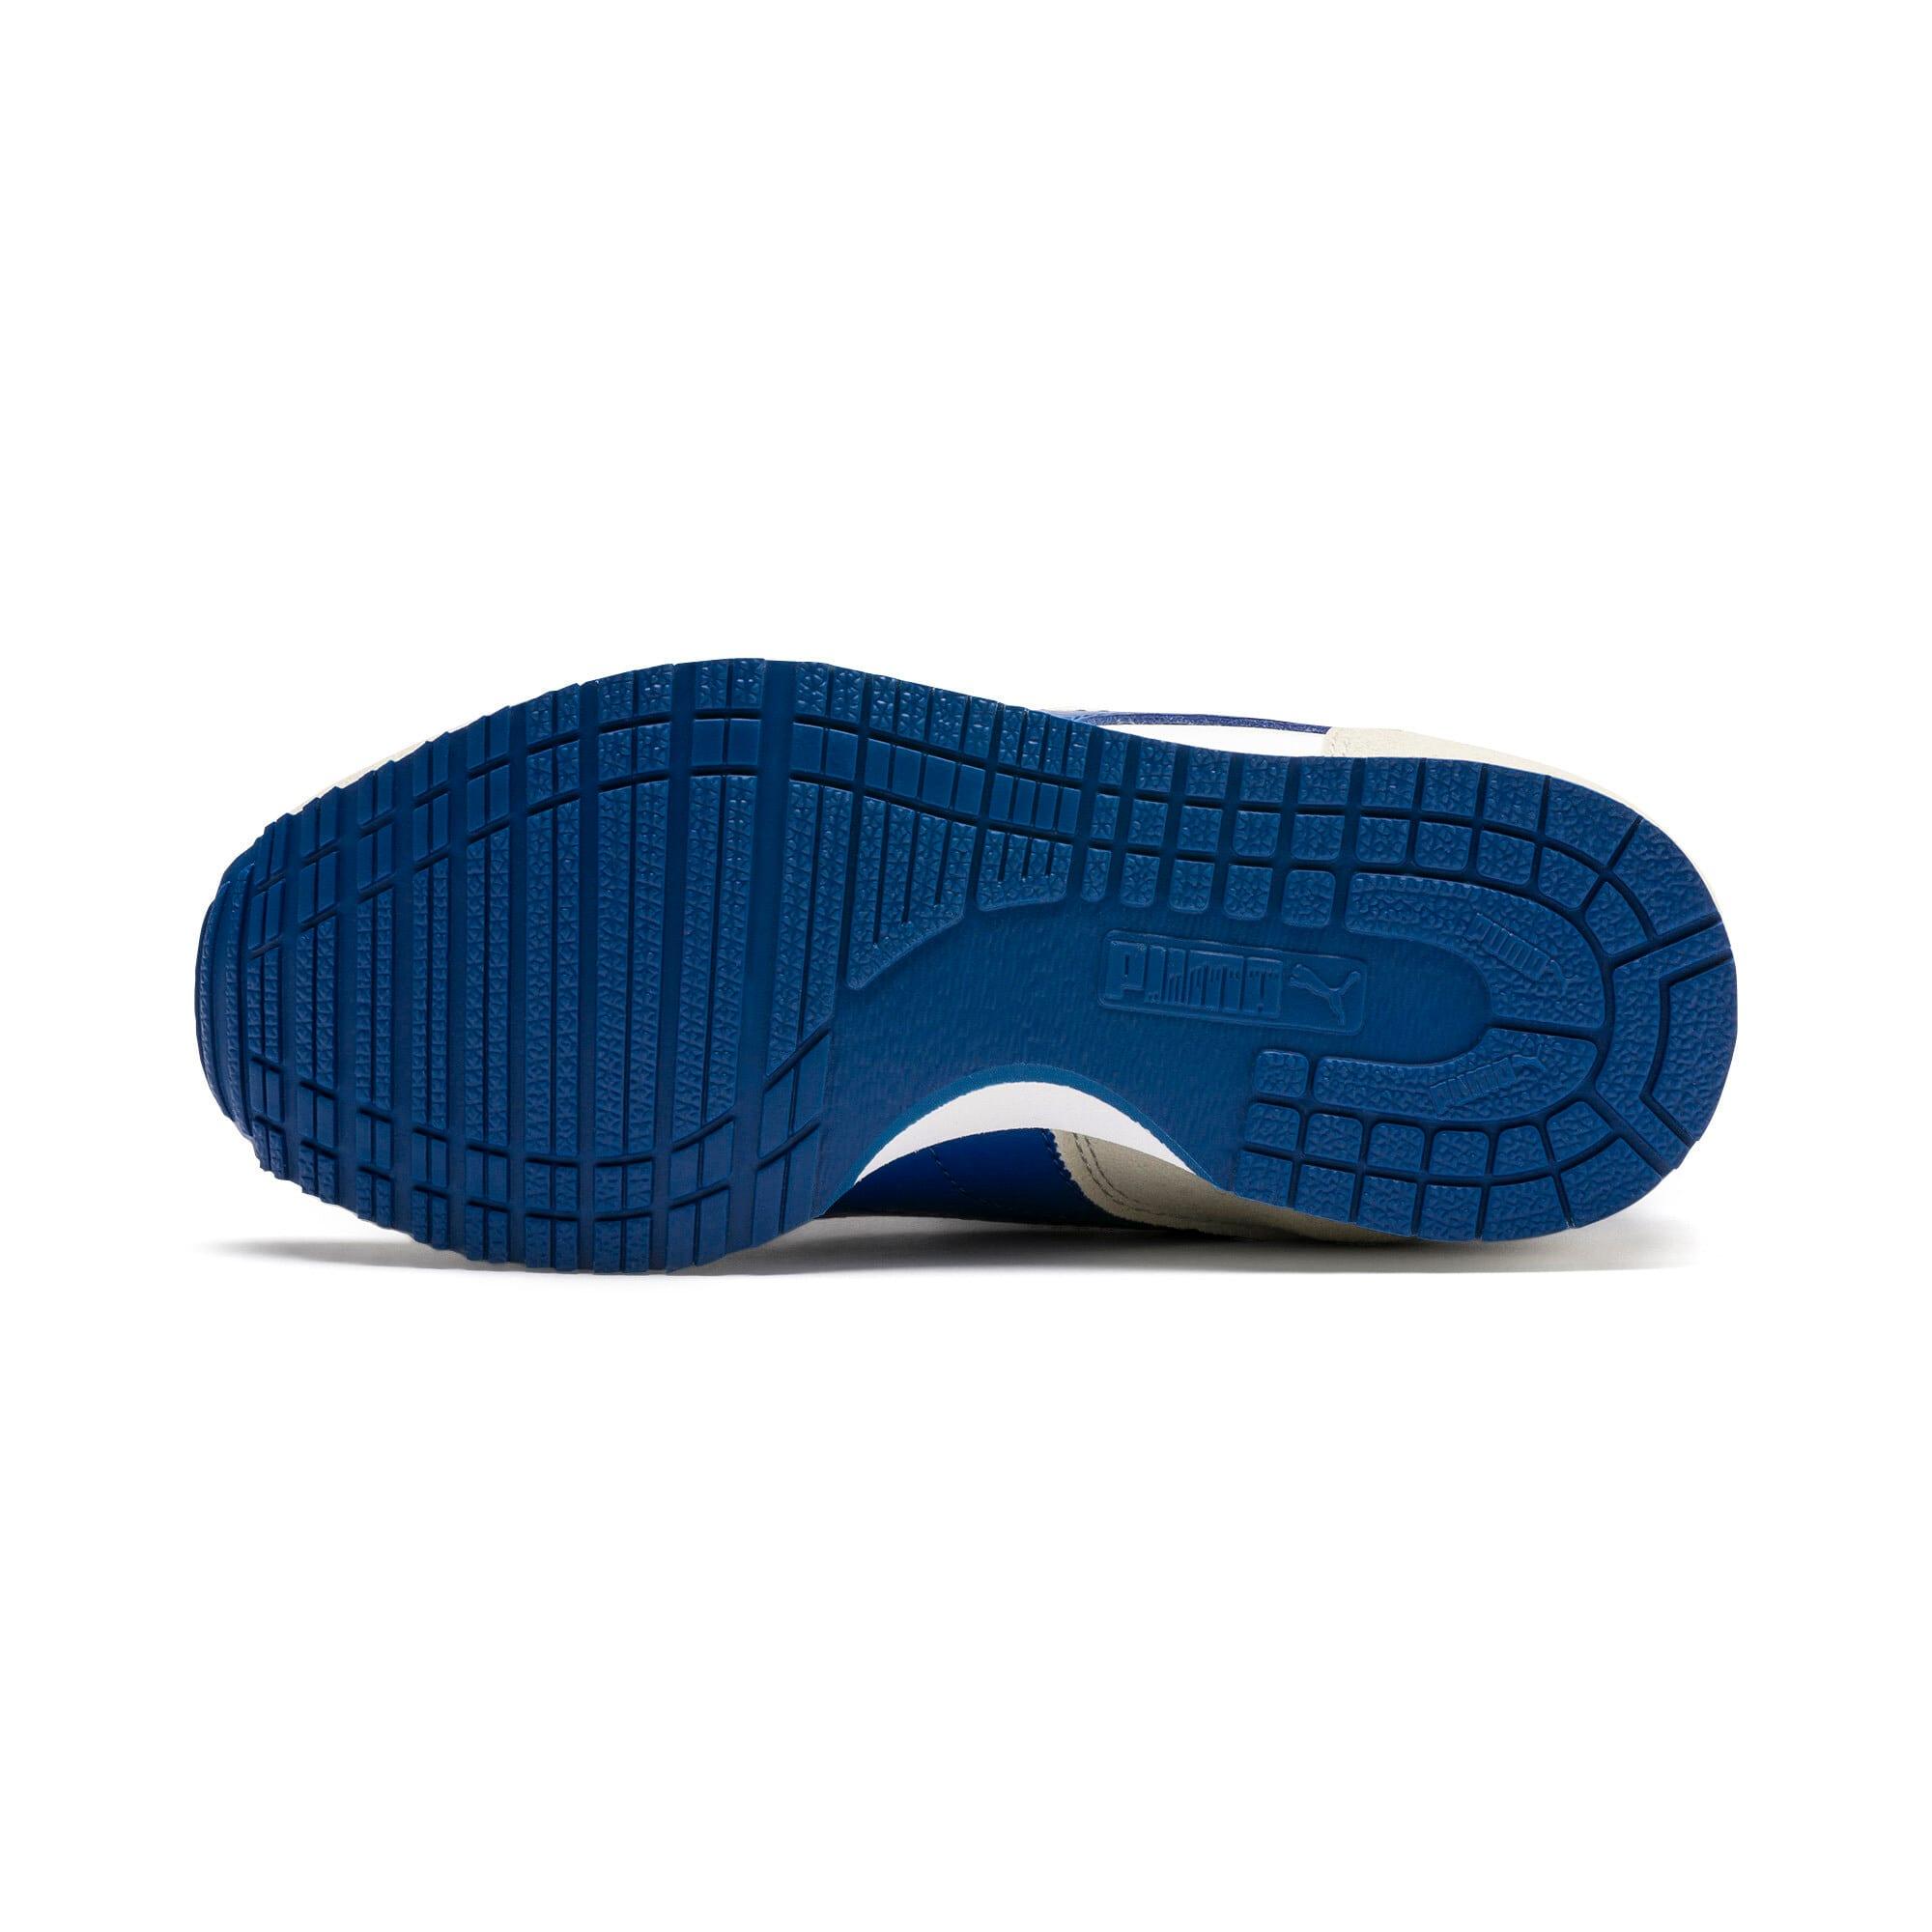 Thumbnail 4 of Cabana Racer SL V PS Baby Sneaker, Puma White-Galaxy Blue, medium